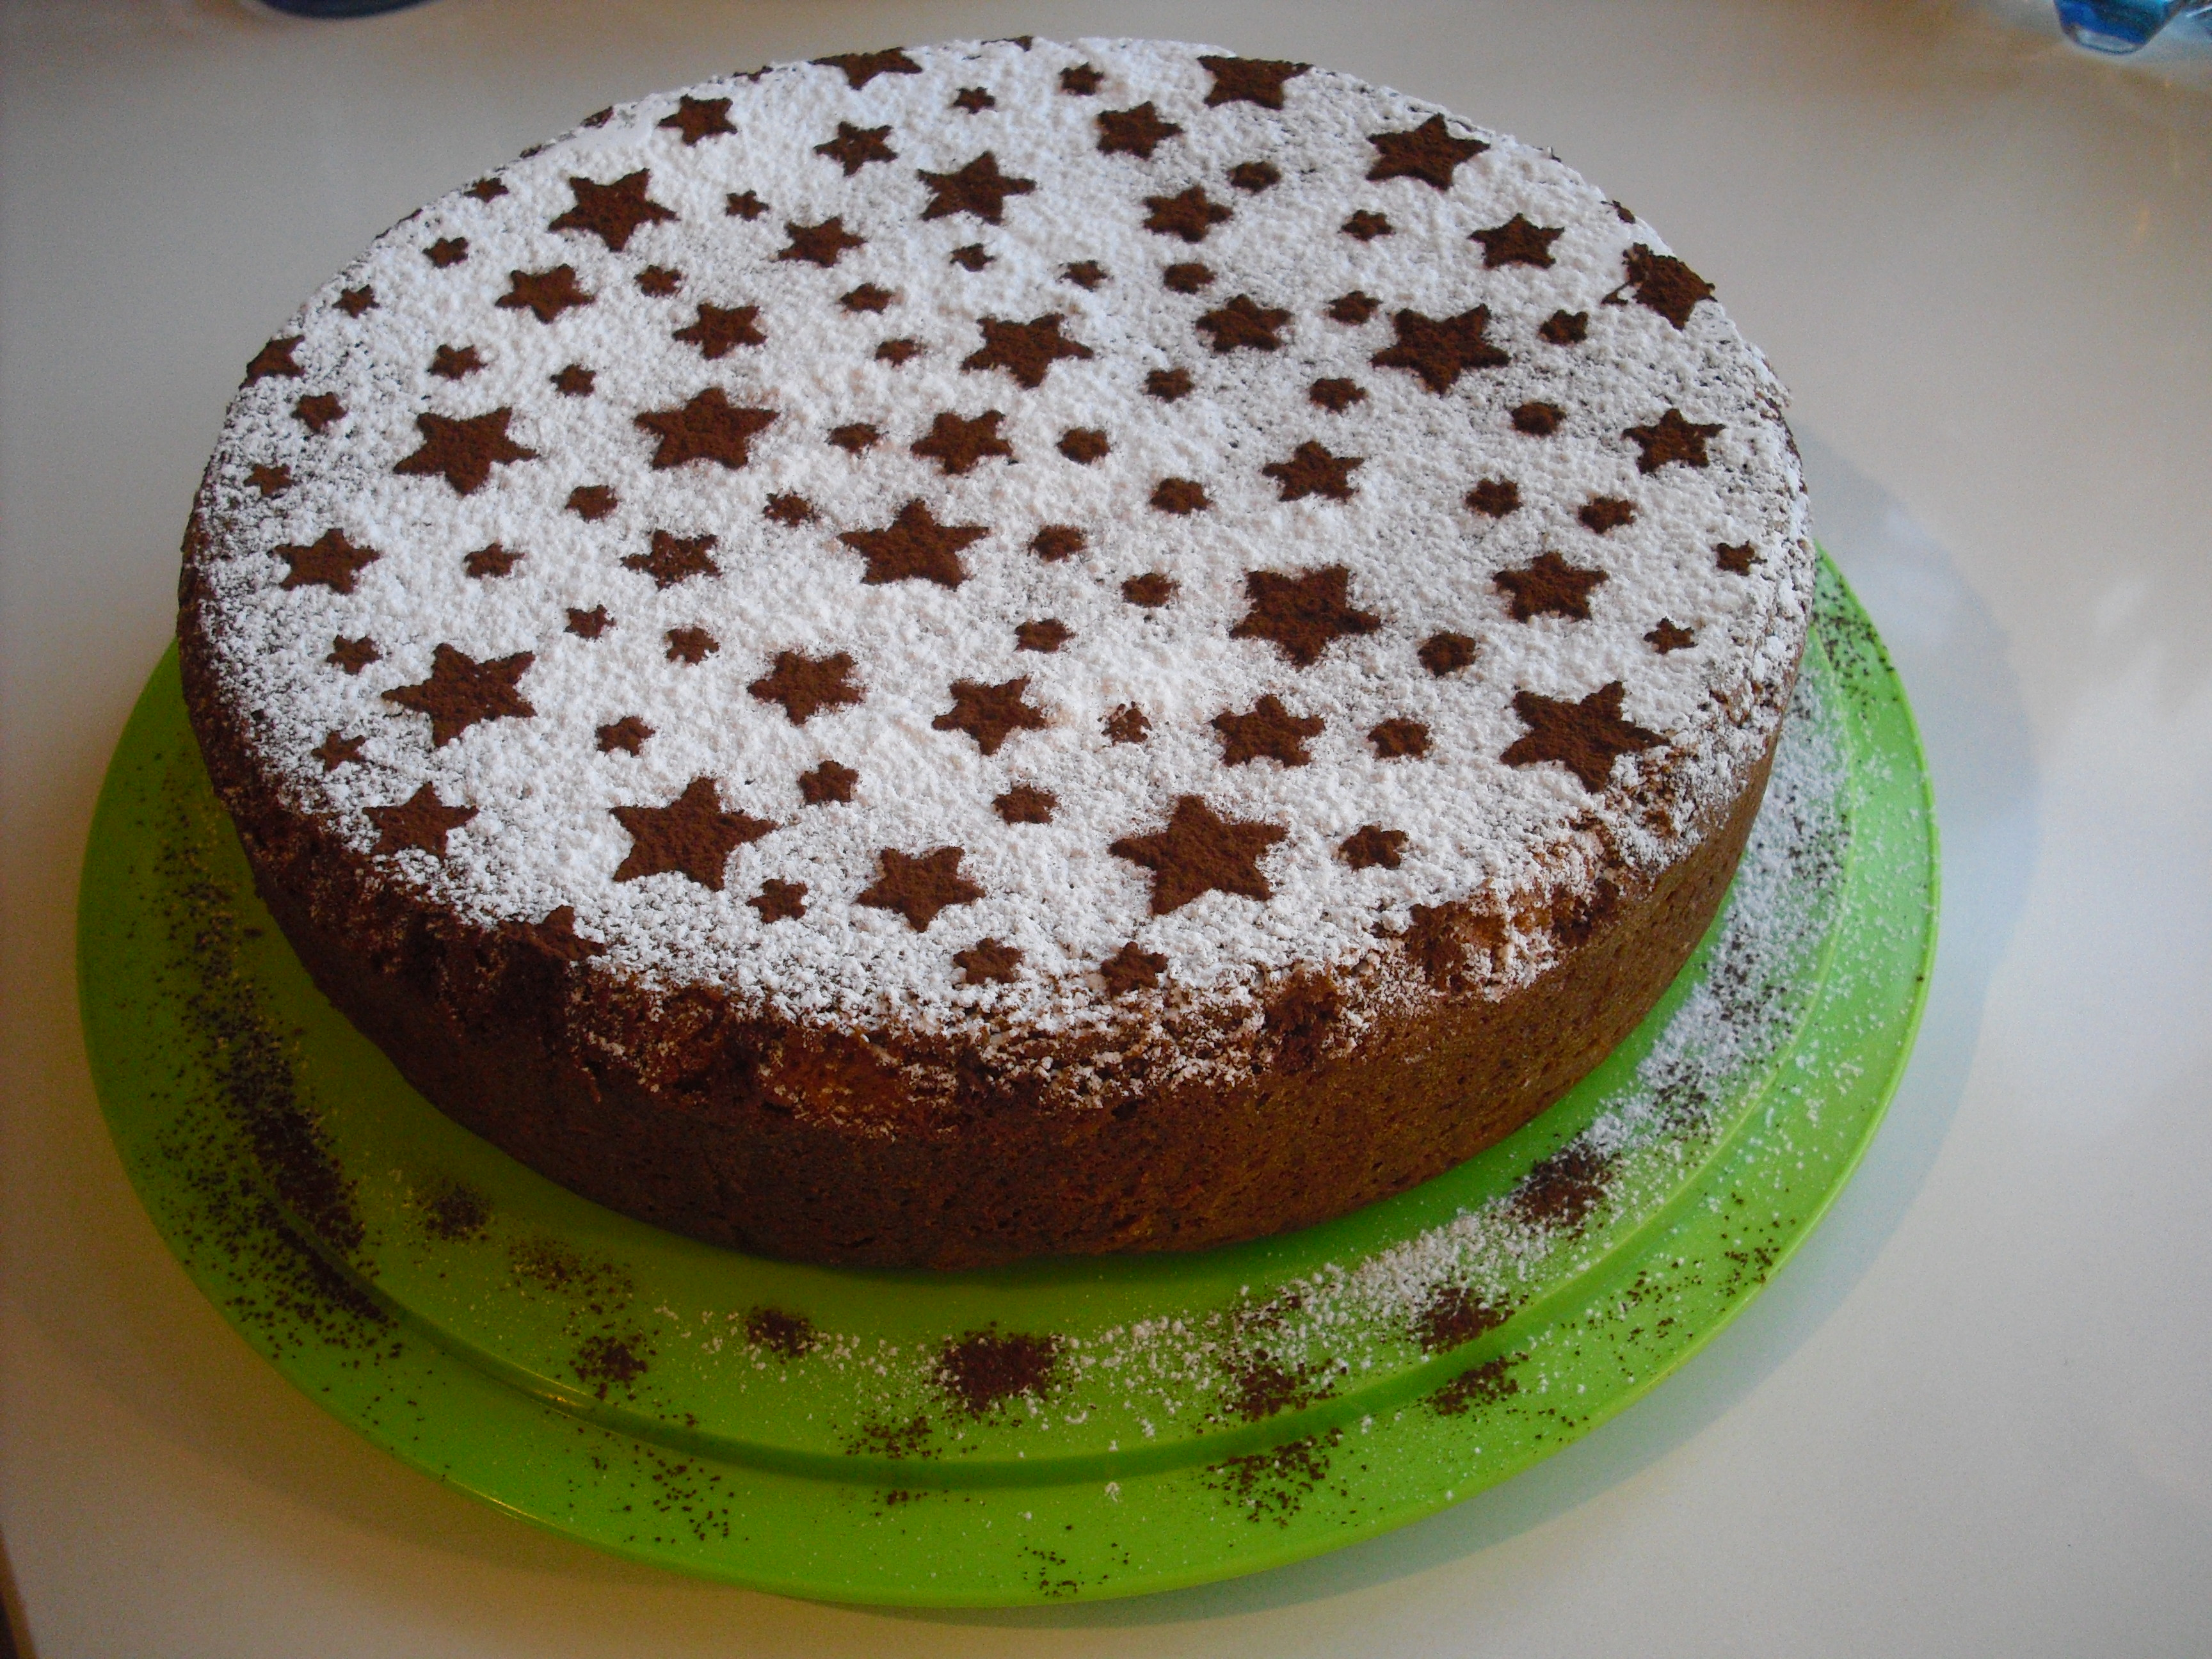 Torta al cioccolato bianco, soffice soffice!